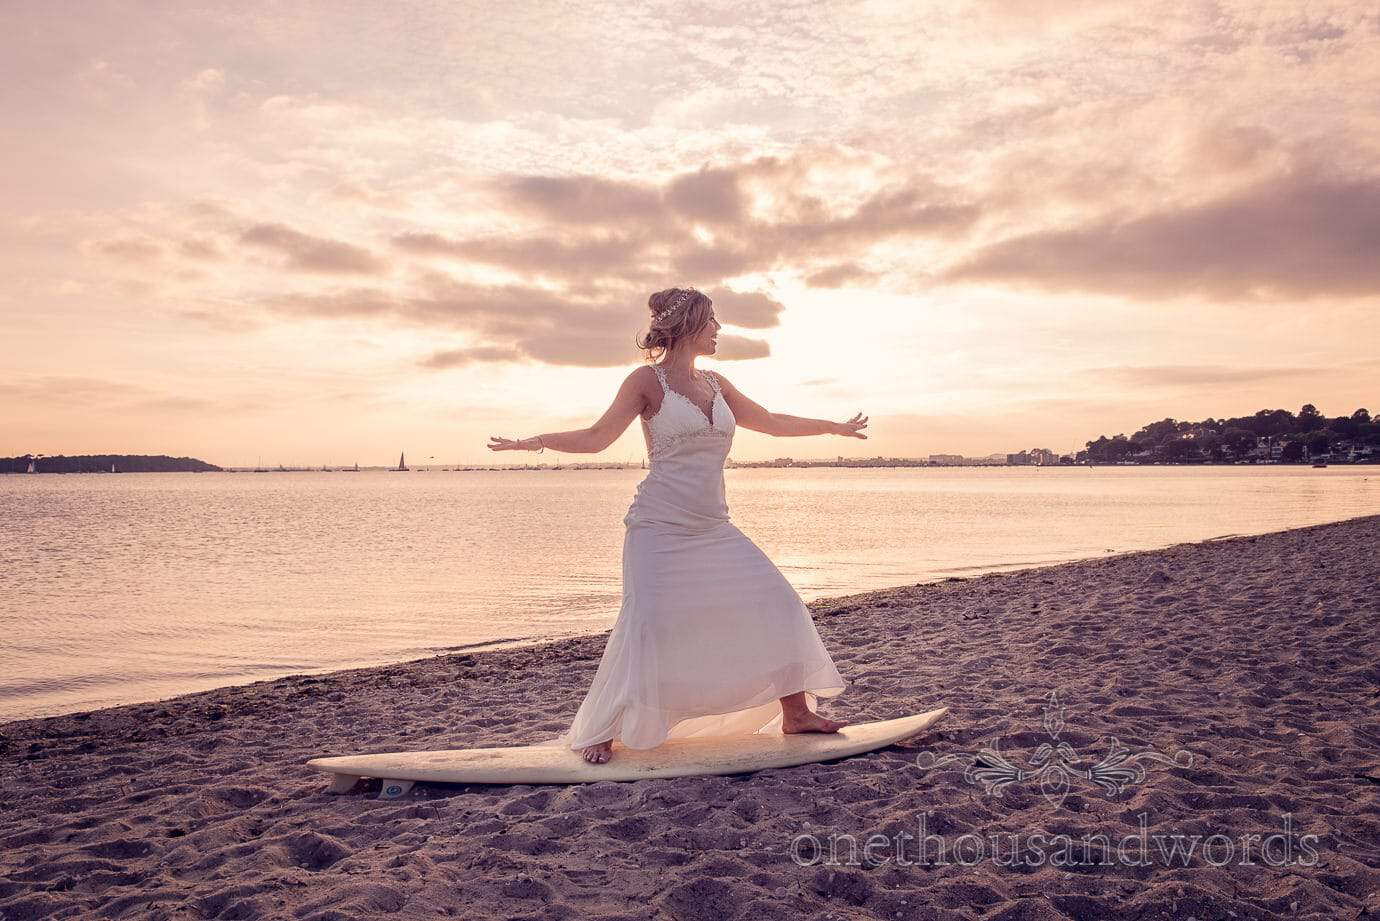 Bride on surfboard at Italian Villa Wedding Photographs